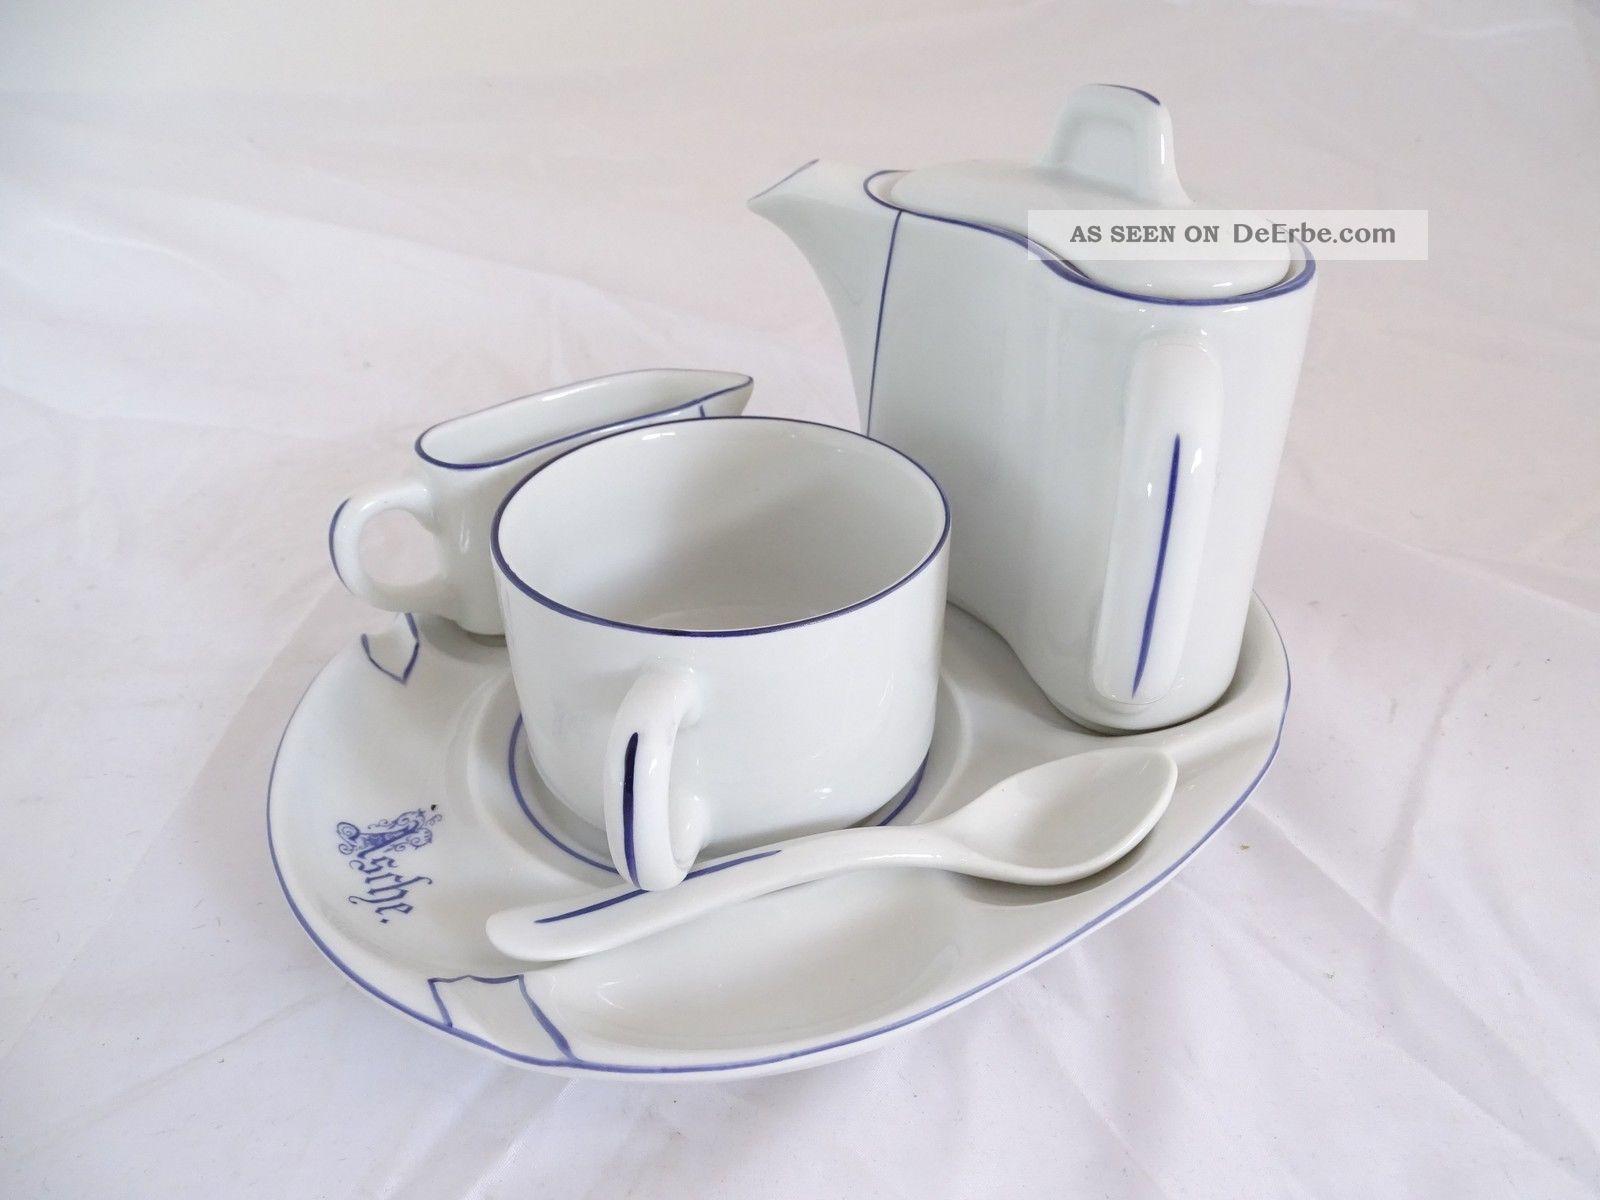 deutsche bahn kaffee service mitropa dbgm 701 porzellan lang ebrach top. Black Bedroom Furniture Sets. Home Design Ideas